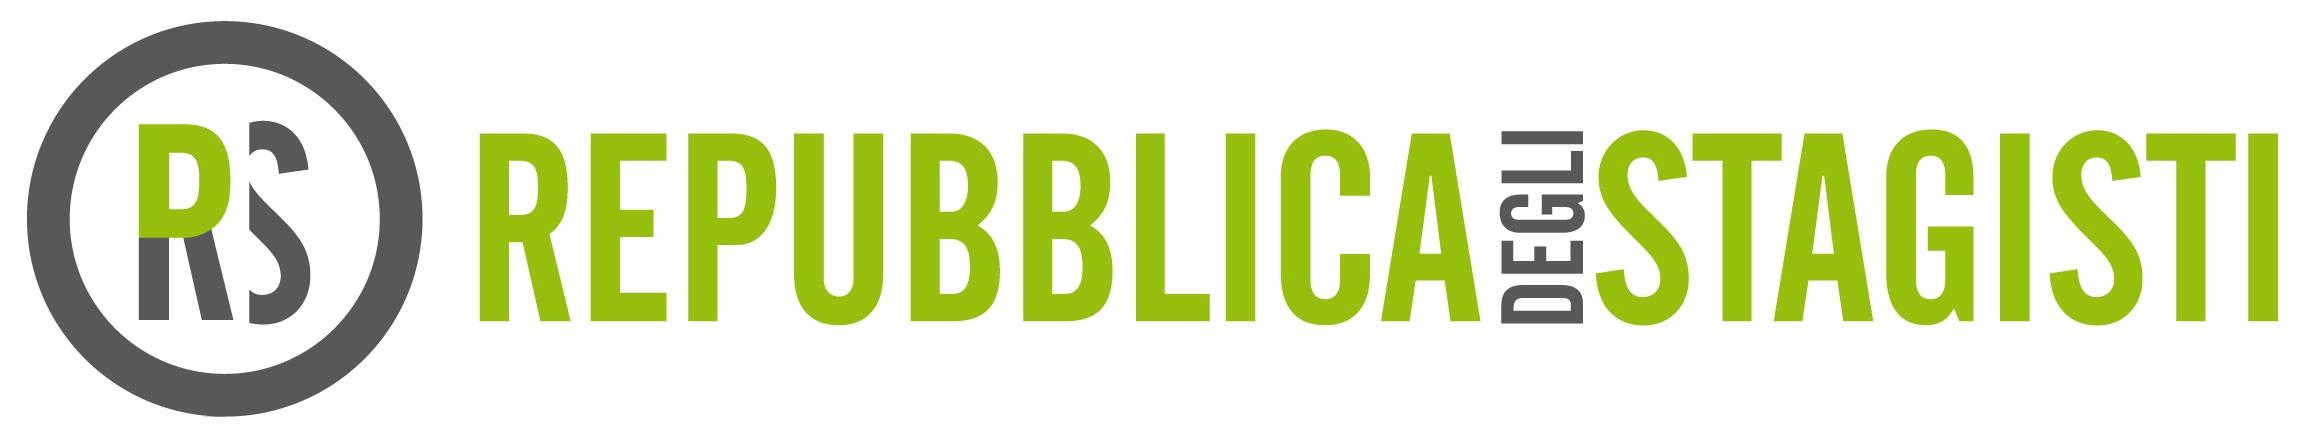 repubblicastagisti_logo.jpg